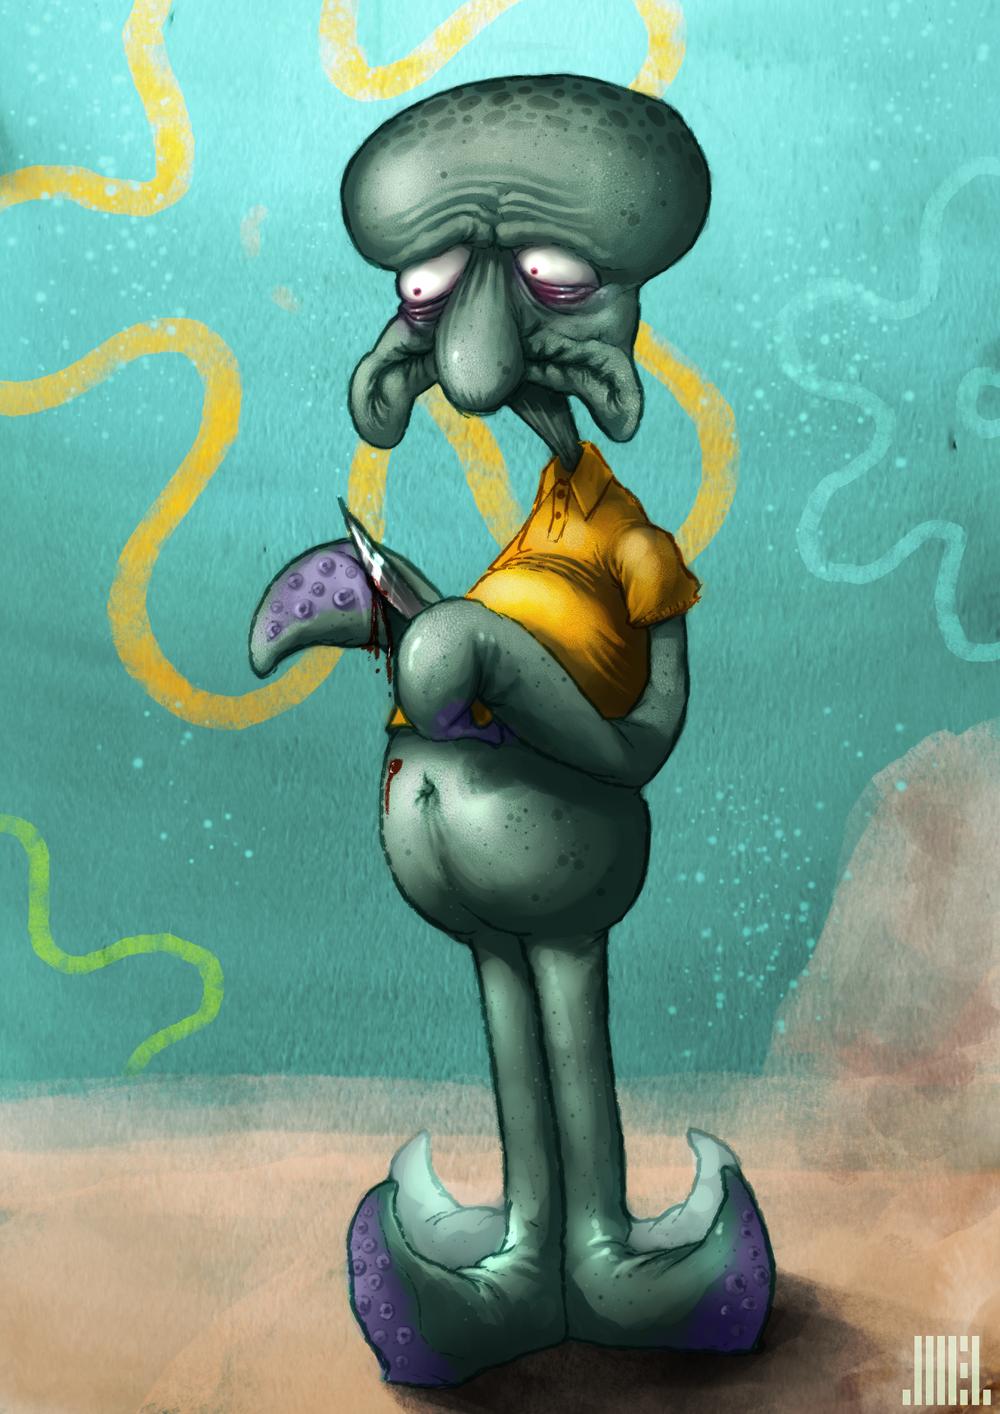 emo squidward has feelings too by joelamatguell on deviantart